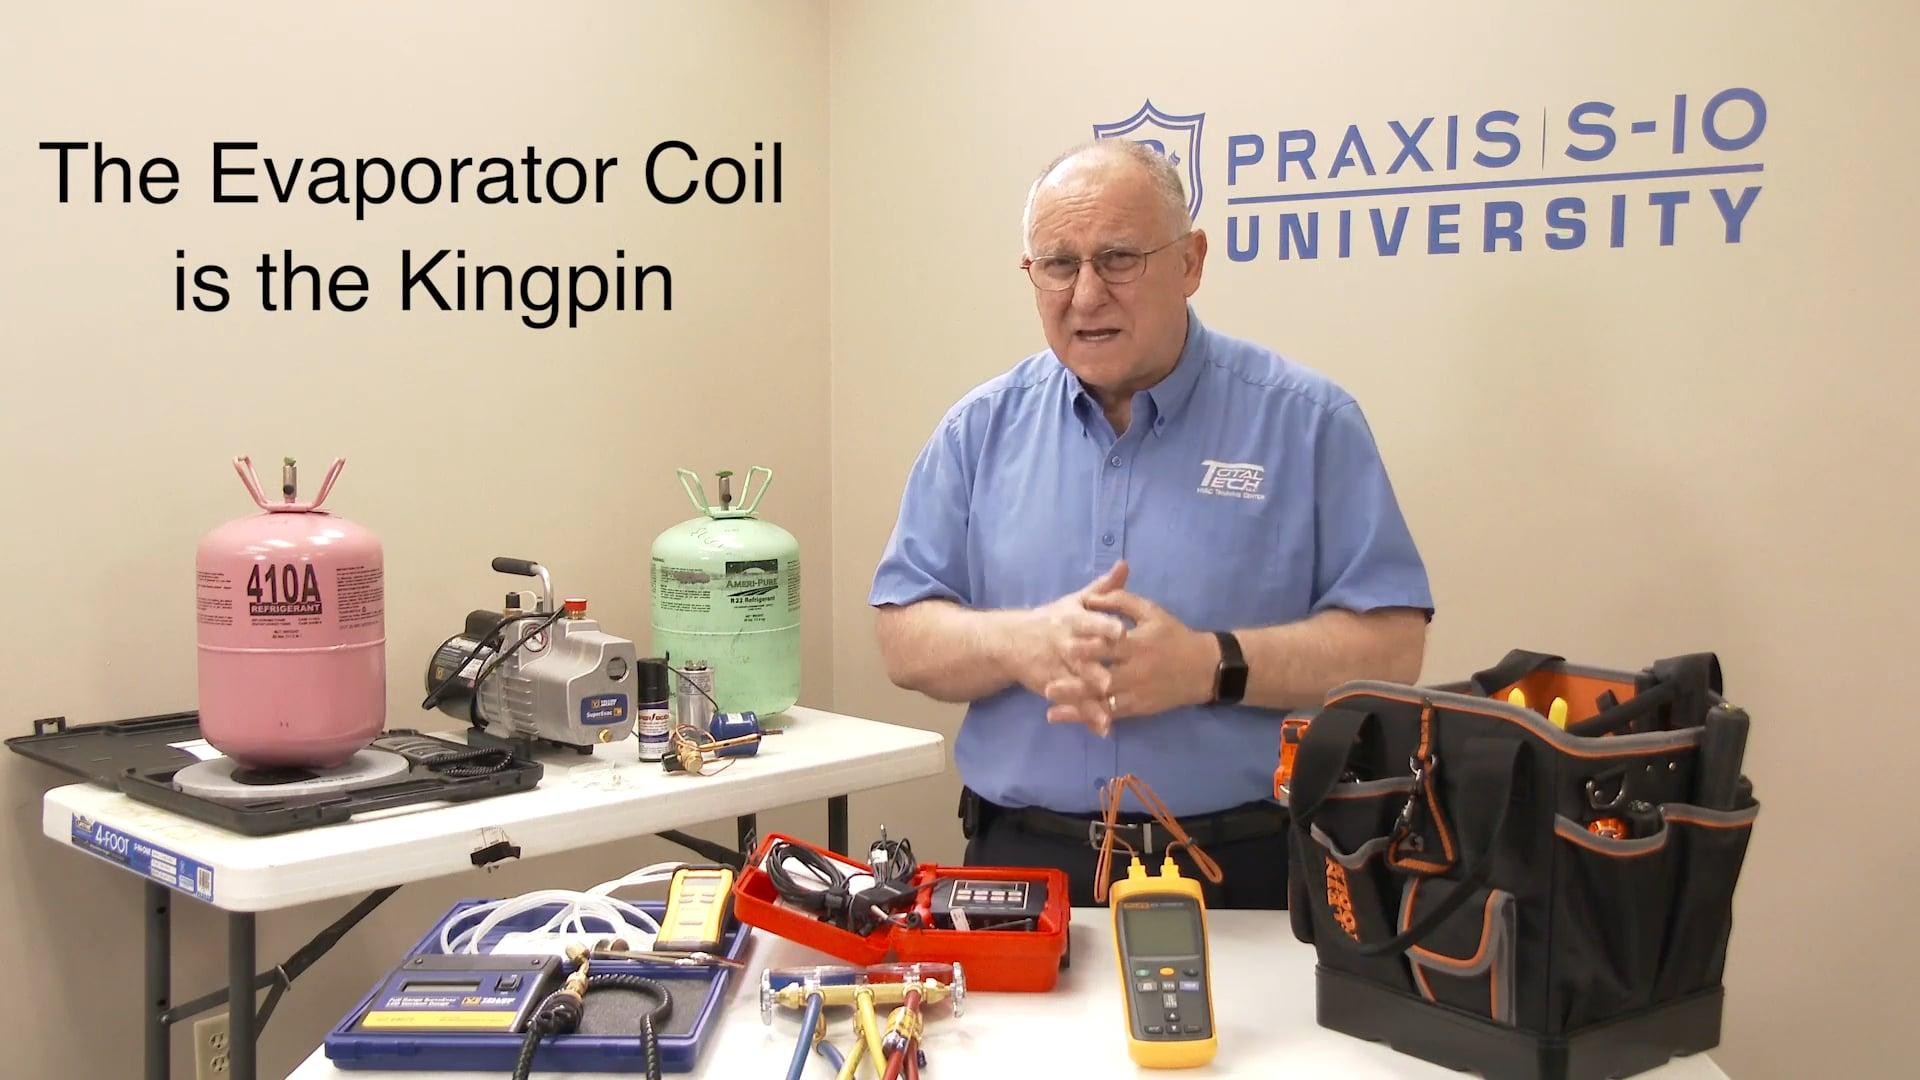 Service Technicians-Evaporator Coil is the Kingpin